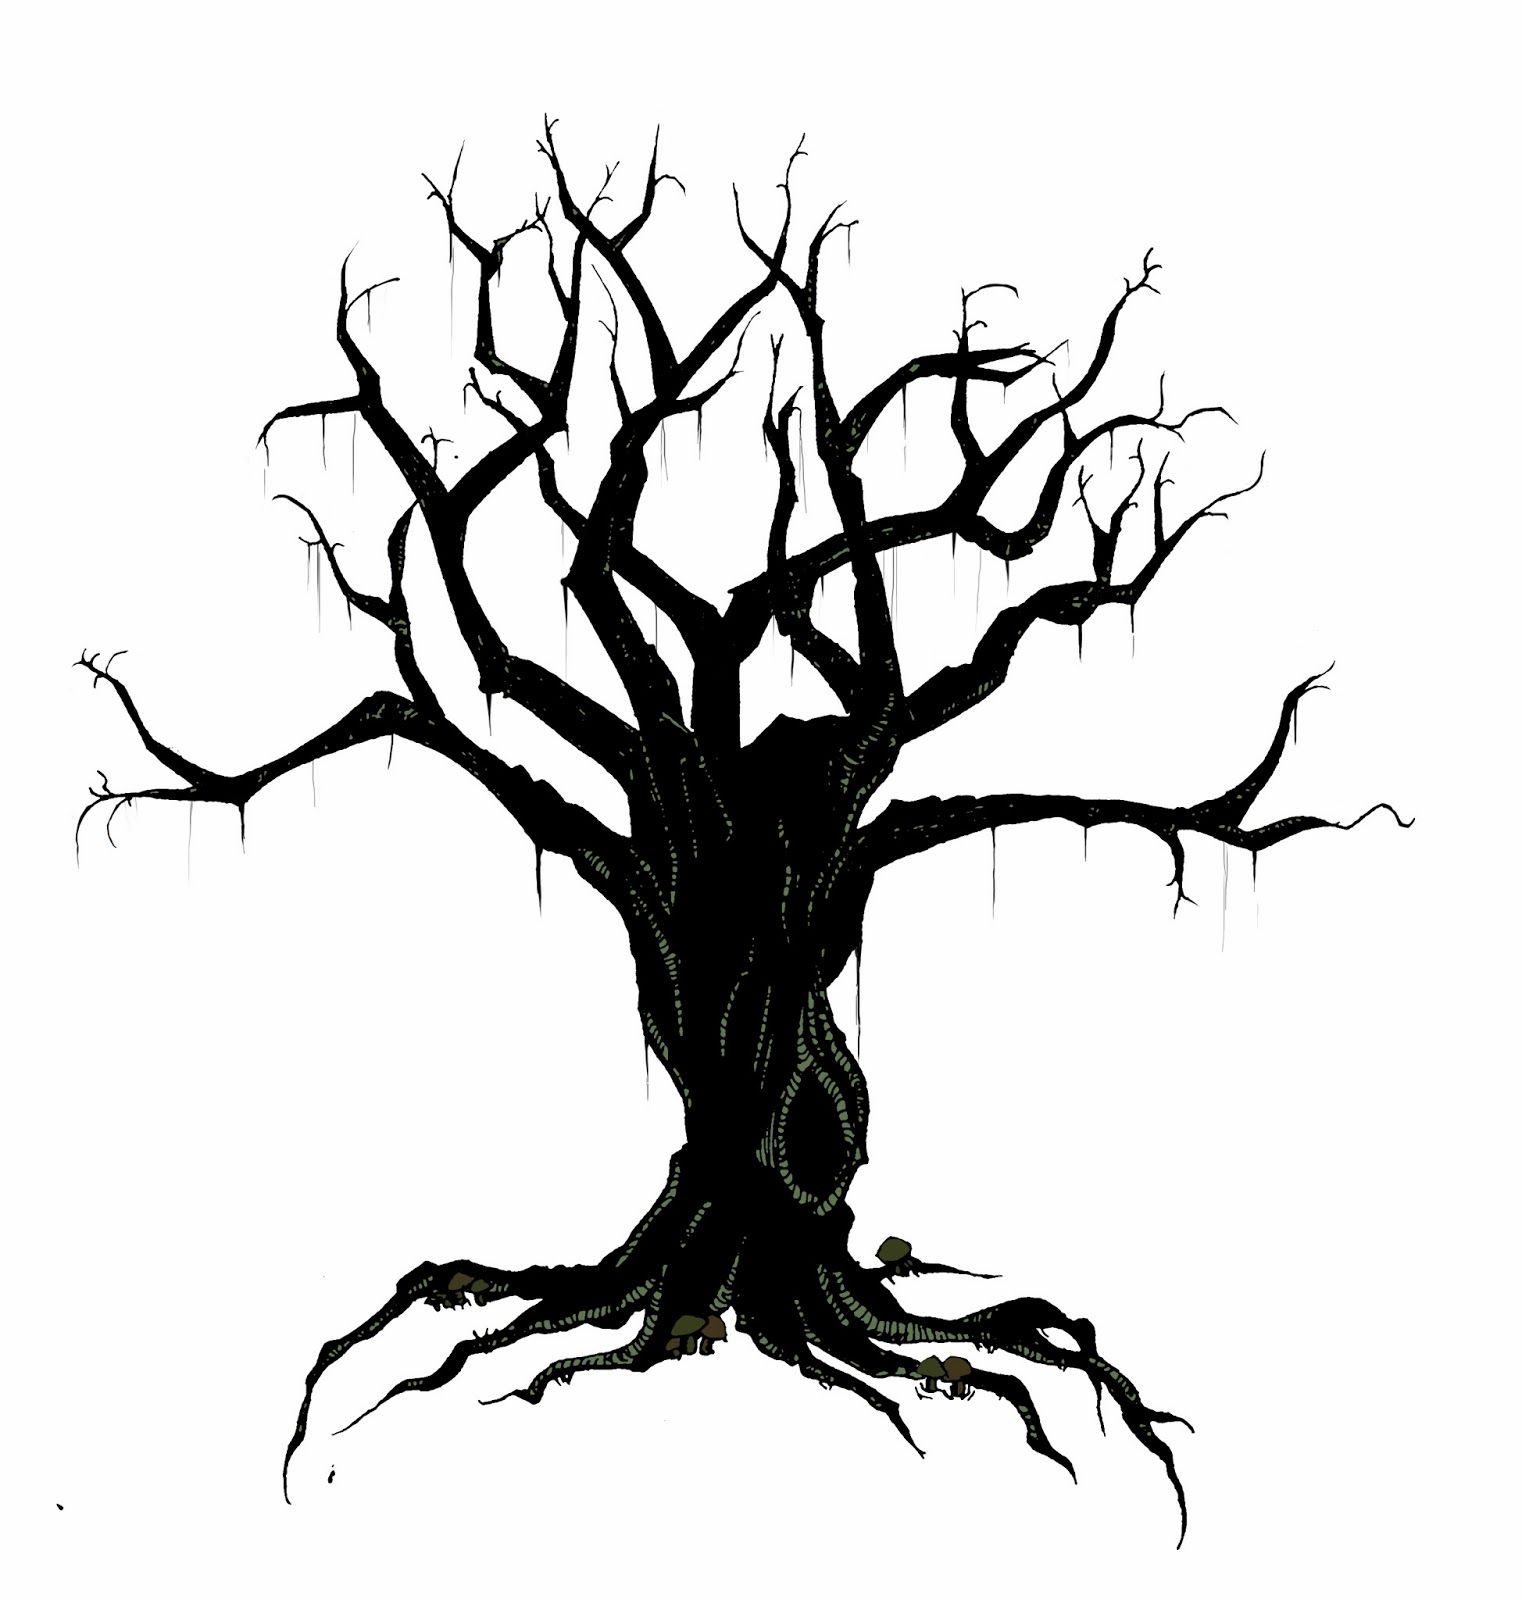 hight resolution of creepy bird in tree silhouette creepy tree